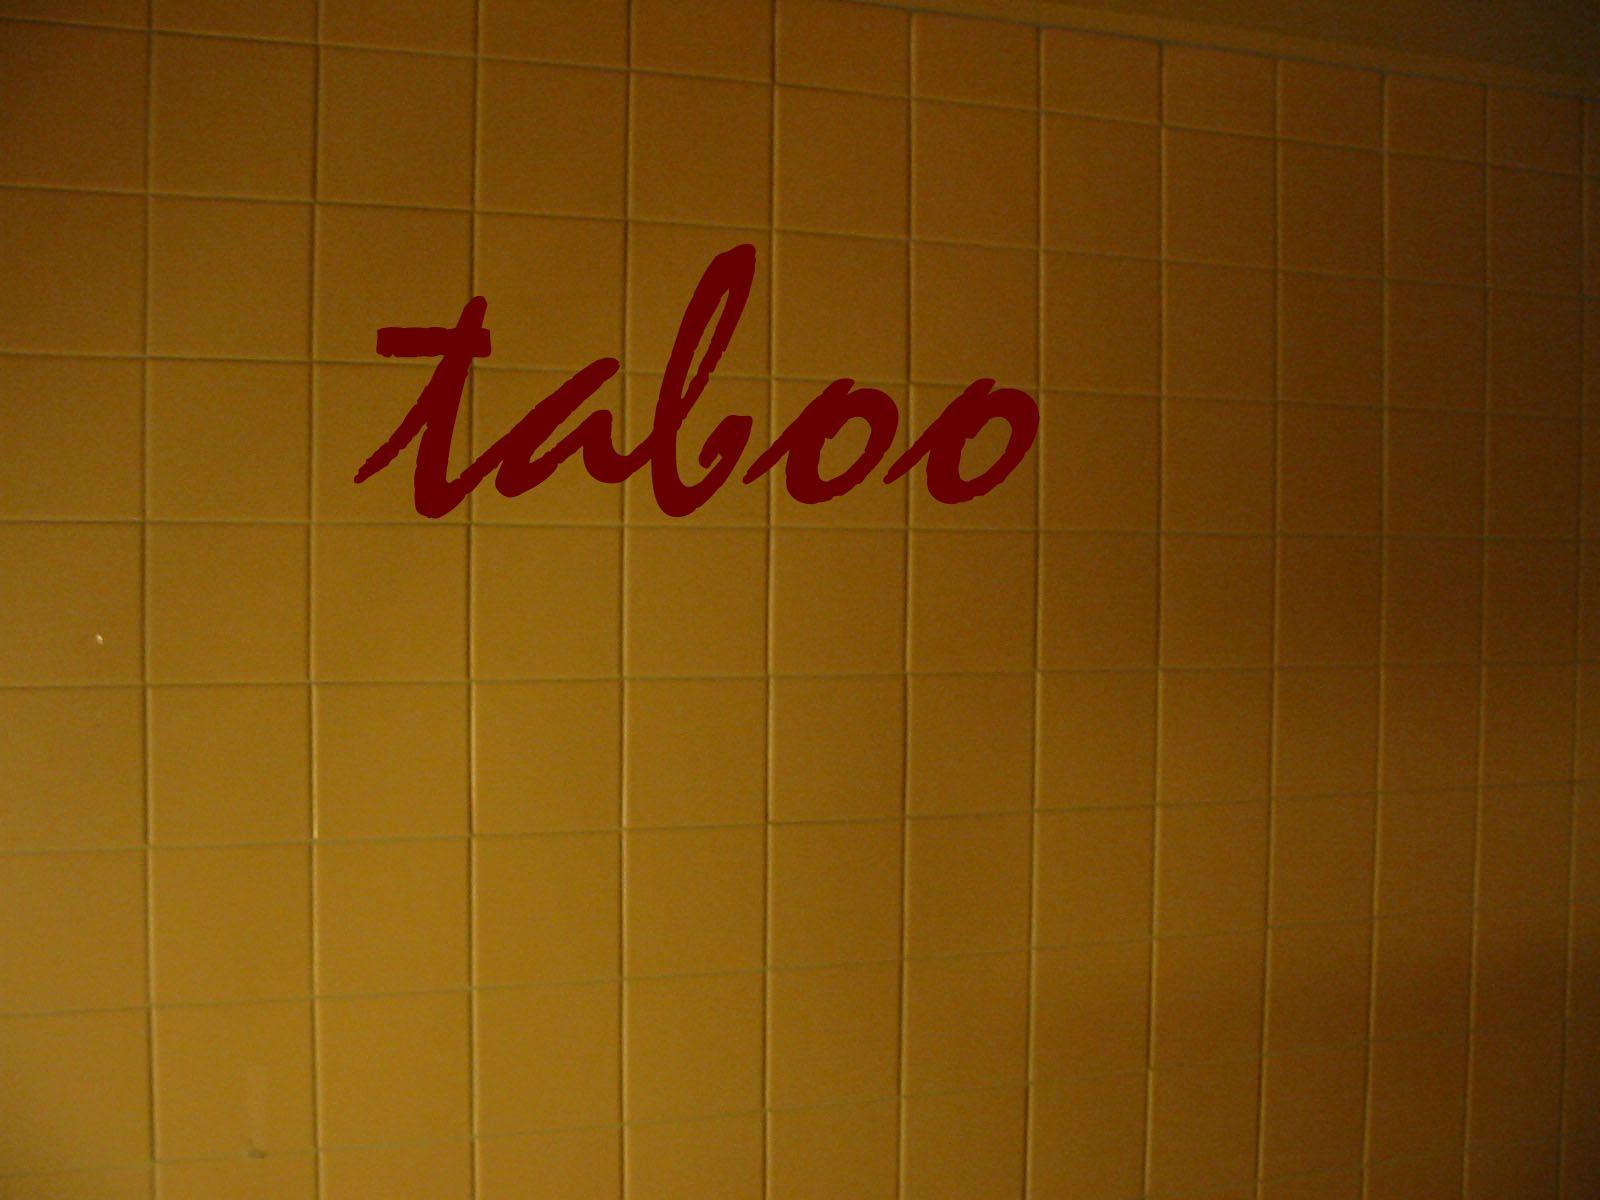 Taboo Wallpapers 1600x1200